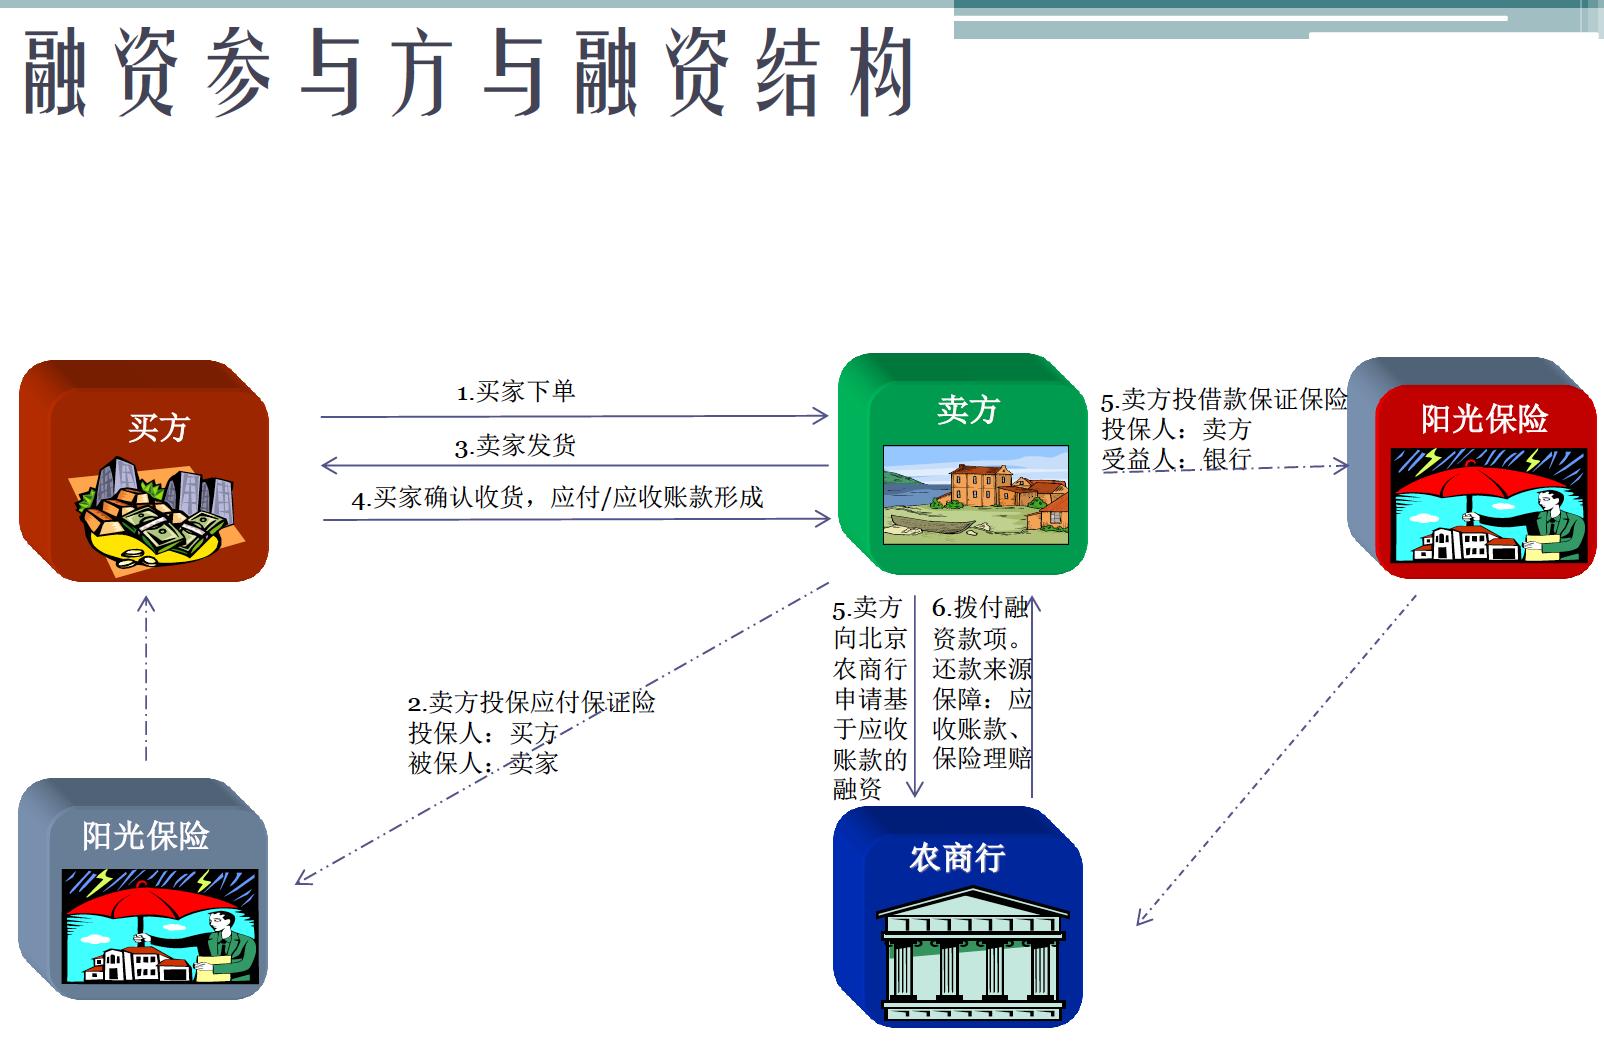 【B2B案例】五阿哥:打造钢铁电商奇特供应链金融风控体系 电子商